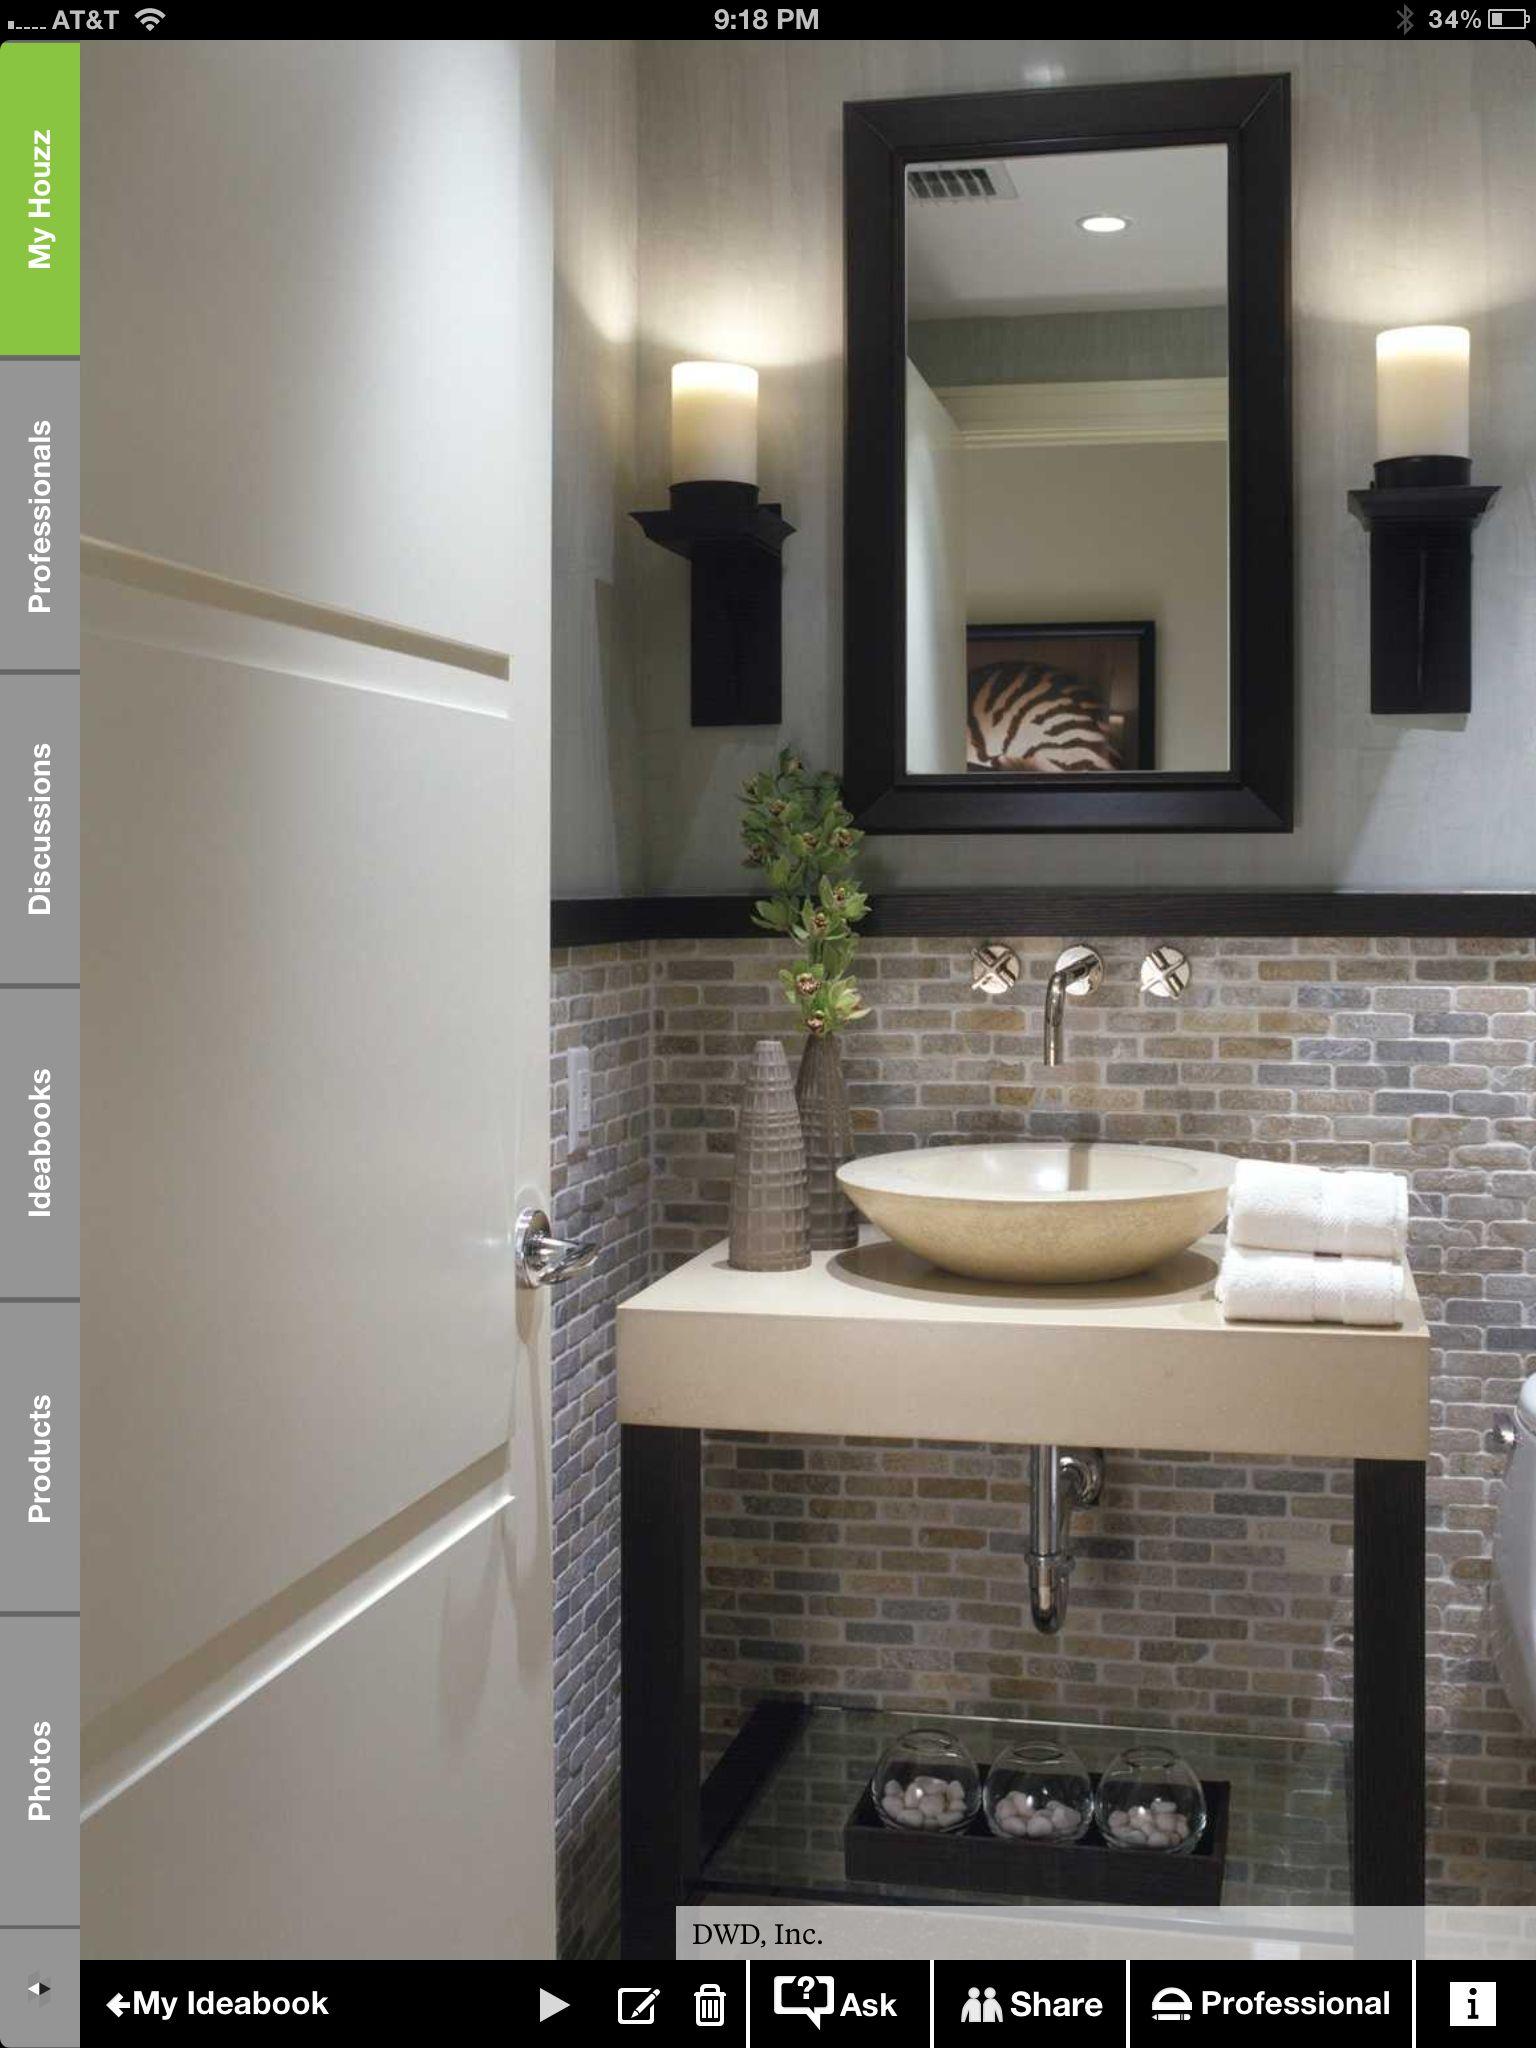 Downstairs Bathroom Tile Decorating Renovation Ideas